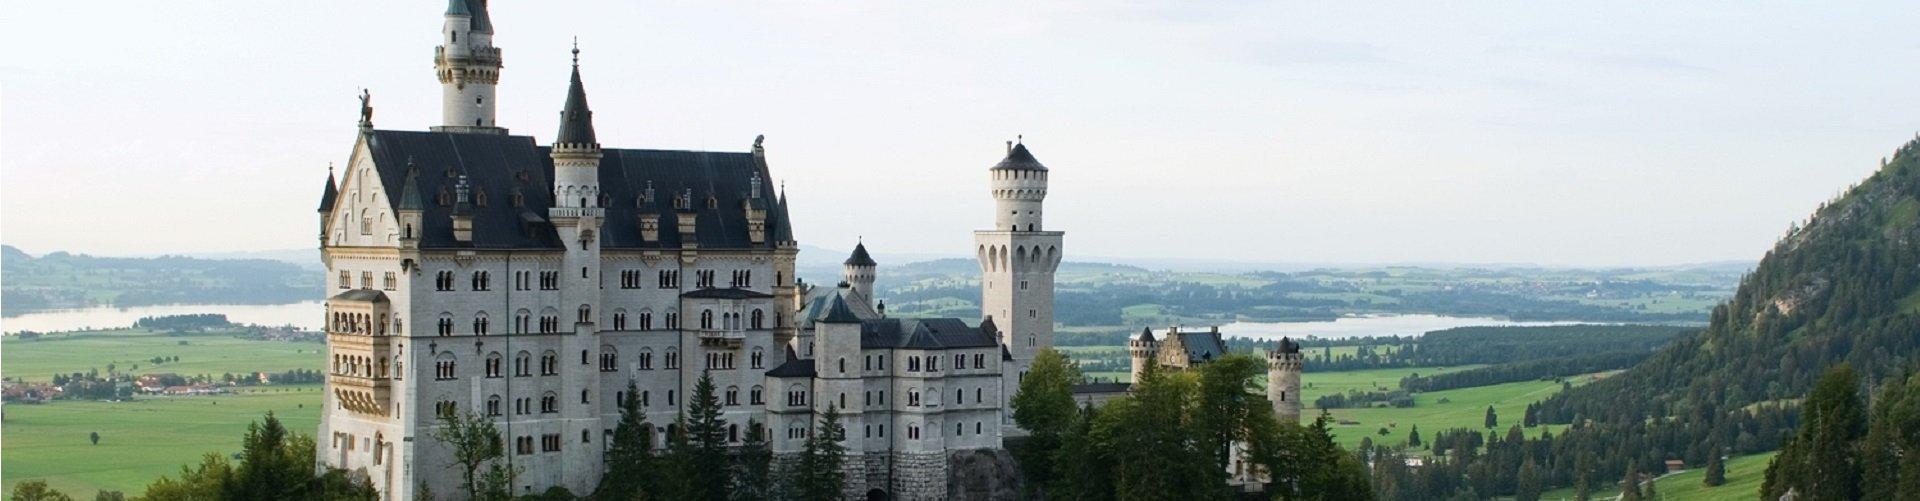 Banner foto Duitse Alpenroute Kasteel Neuschwanstein